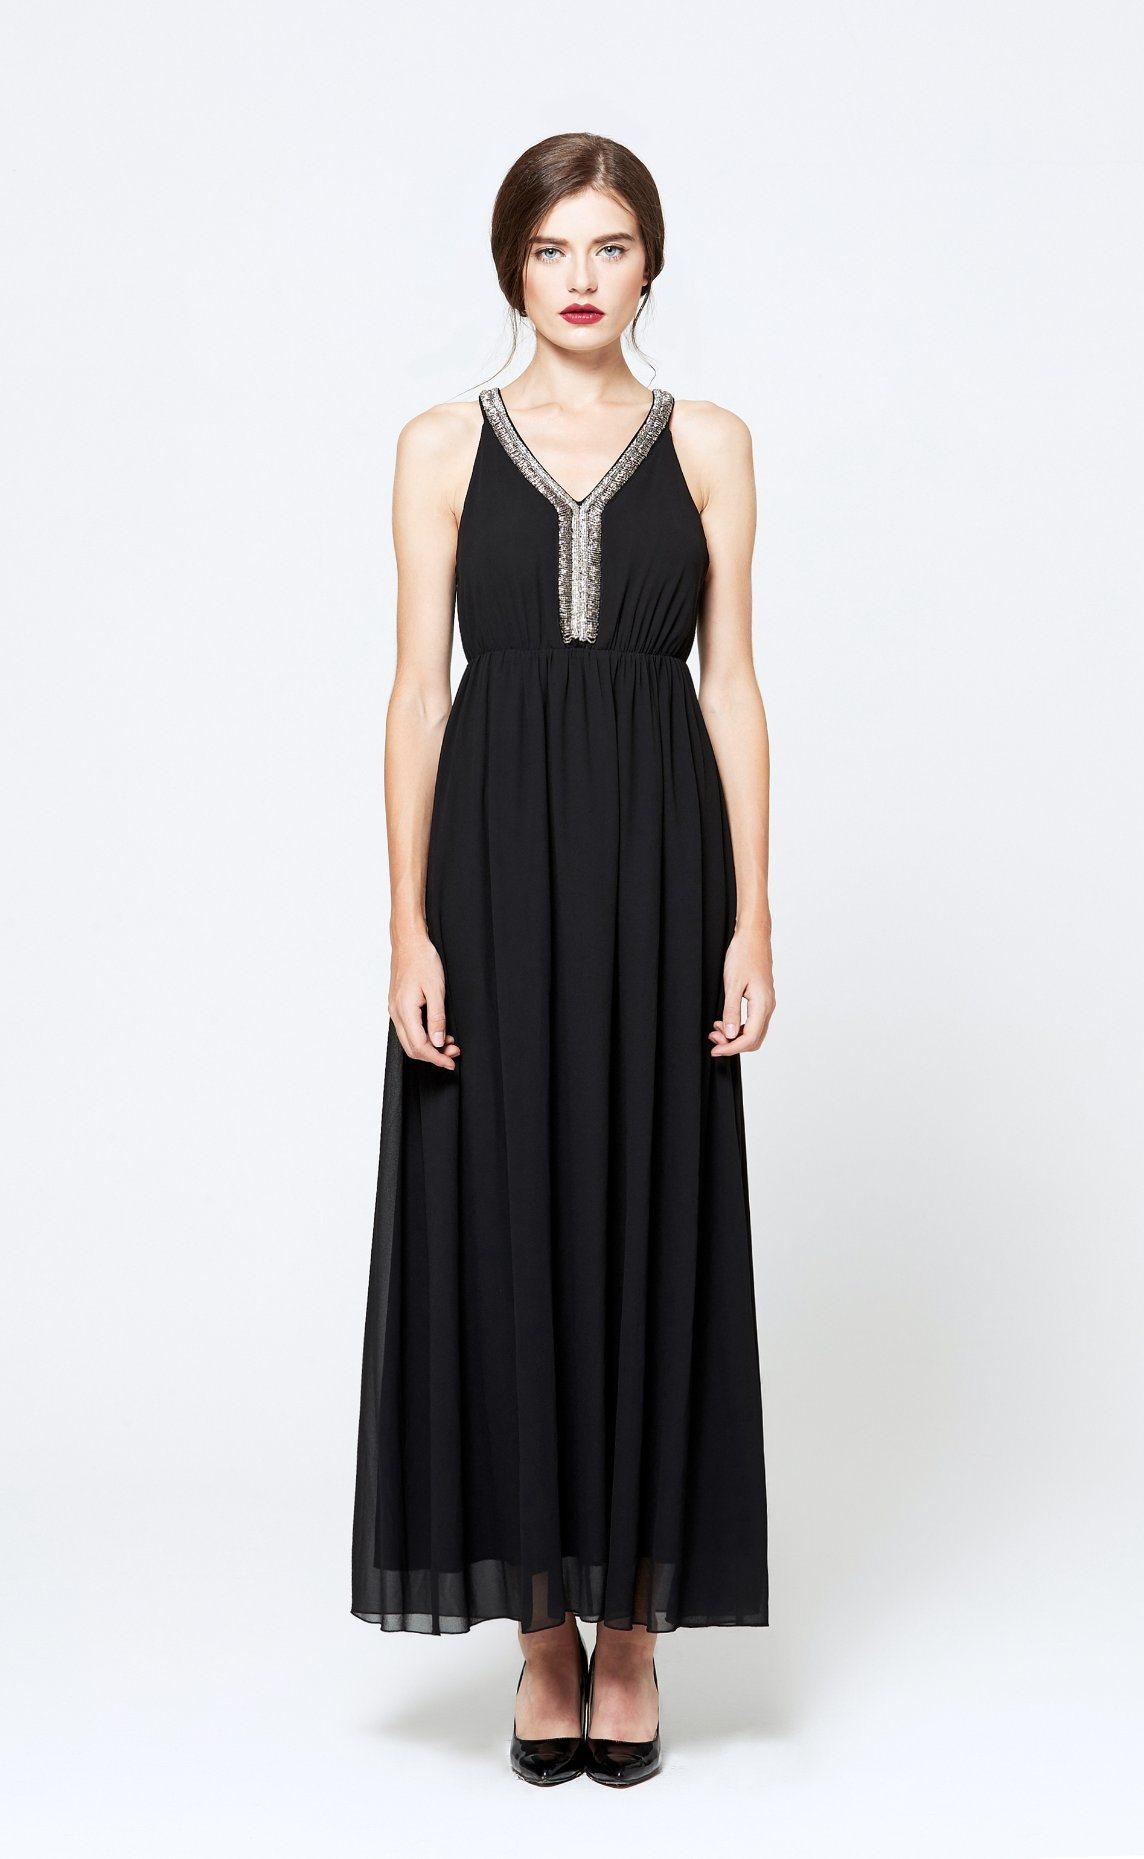 OEM ODM Best Selling Casual Sleeveless Chiffon Black Sexy Dress